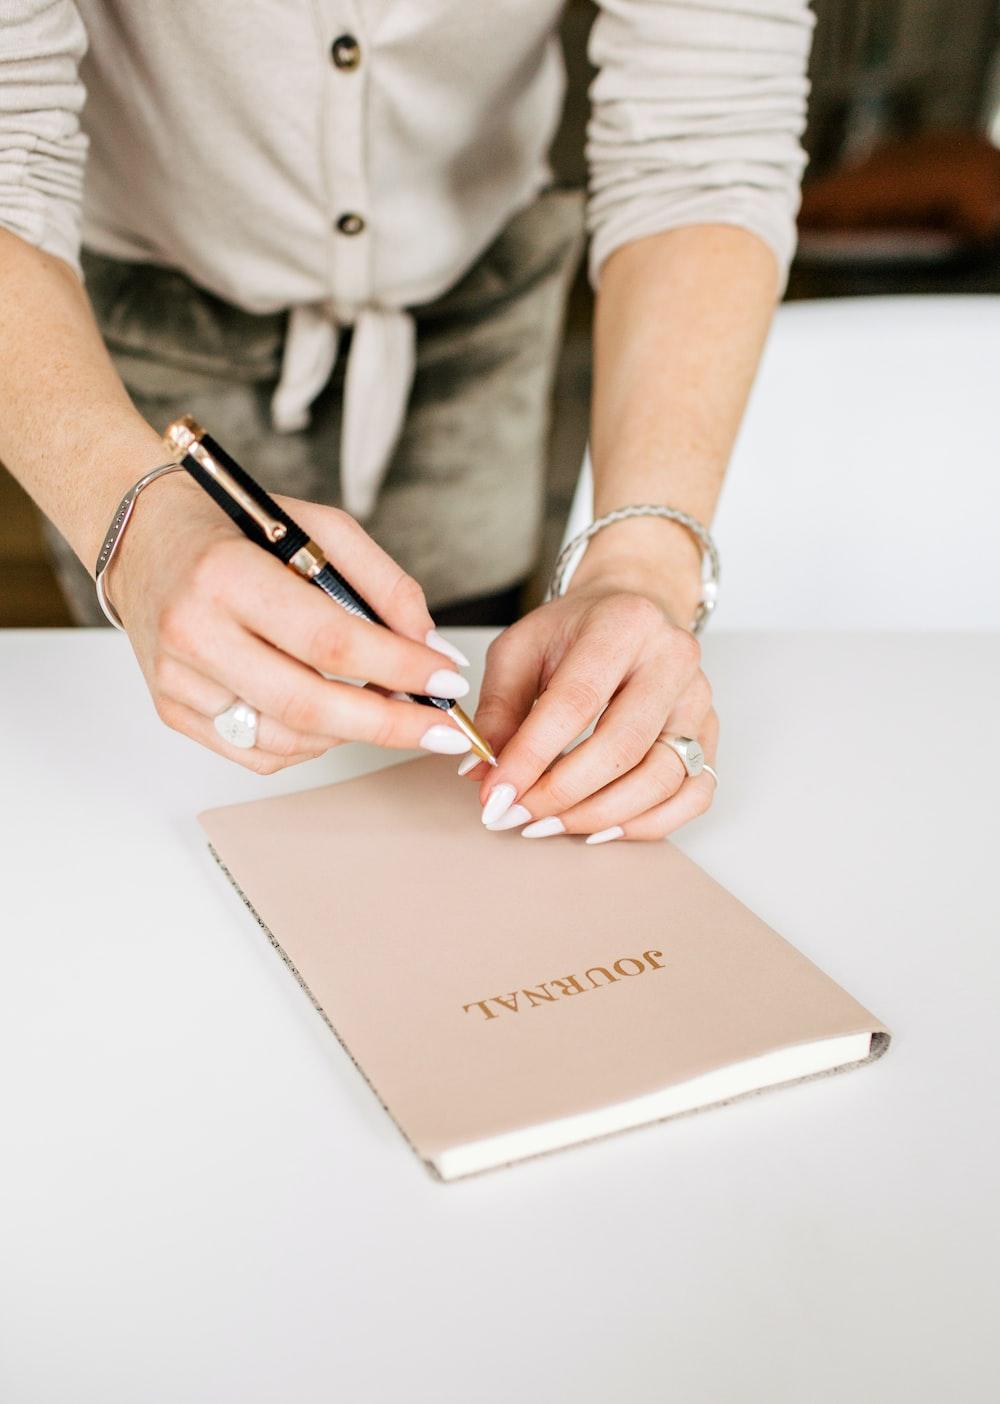 person holding pen near journal book